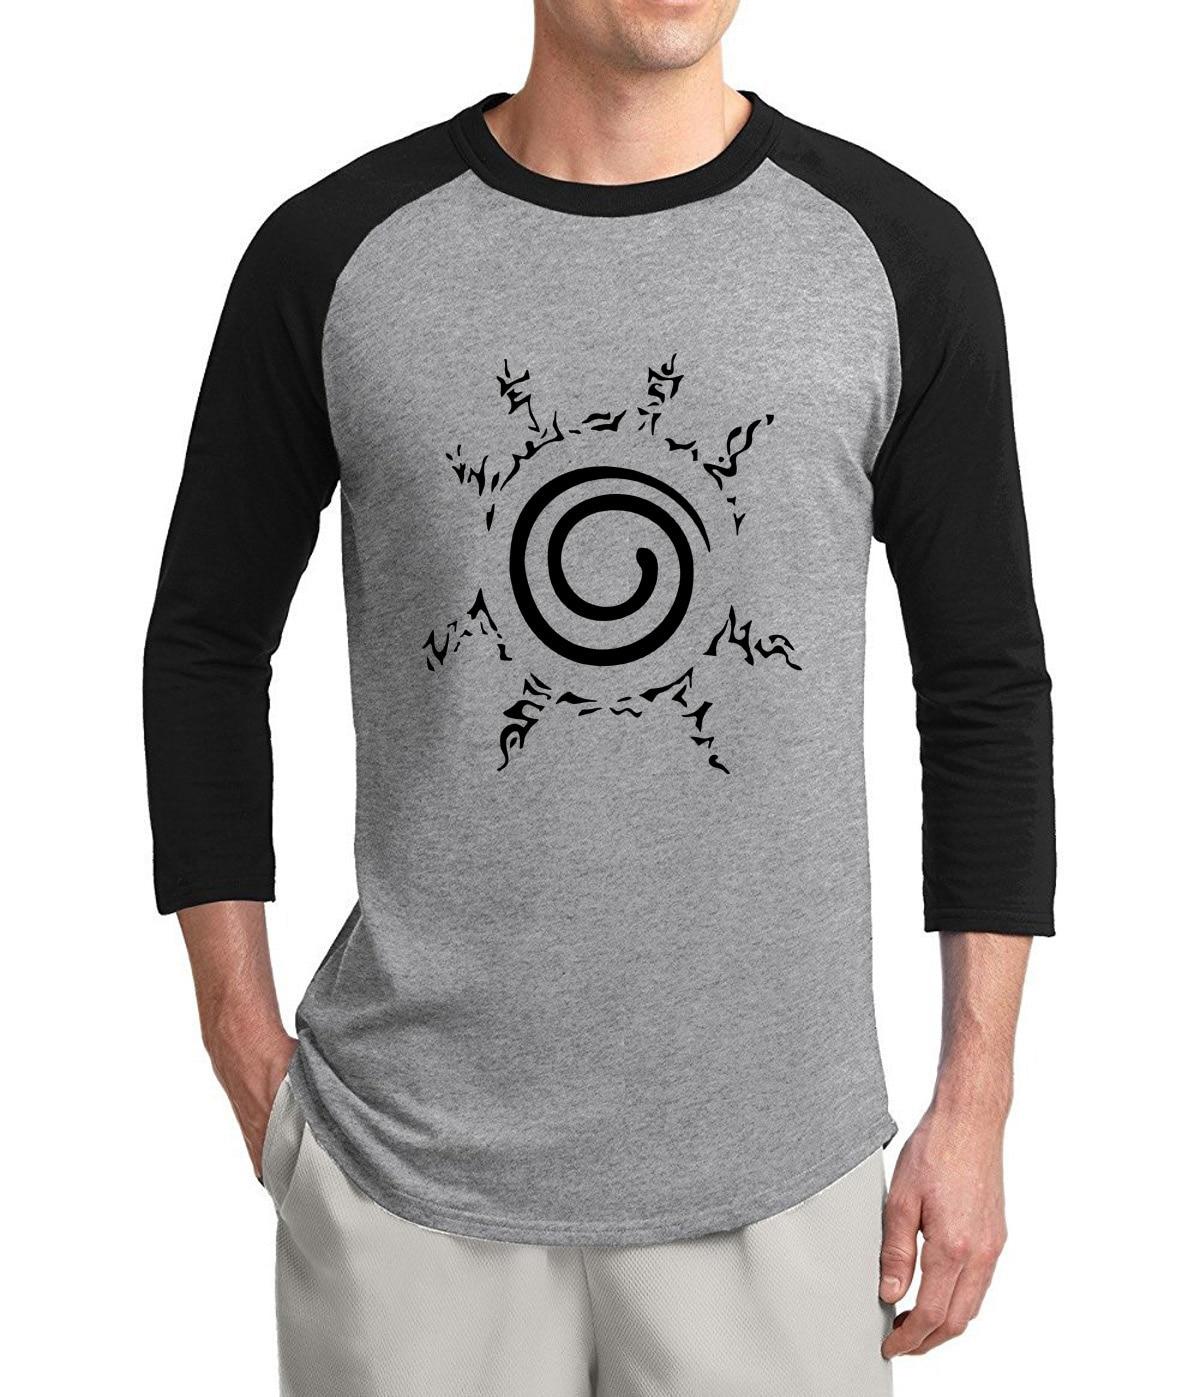 Naruto 8 Trigrams Seal Sweatshirt